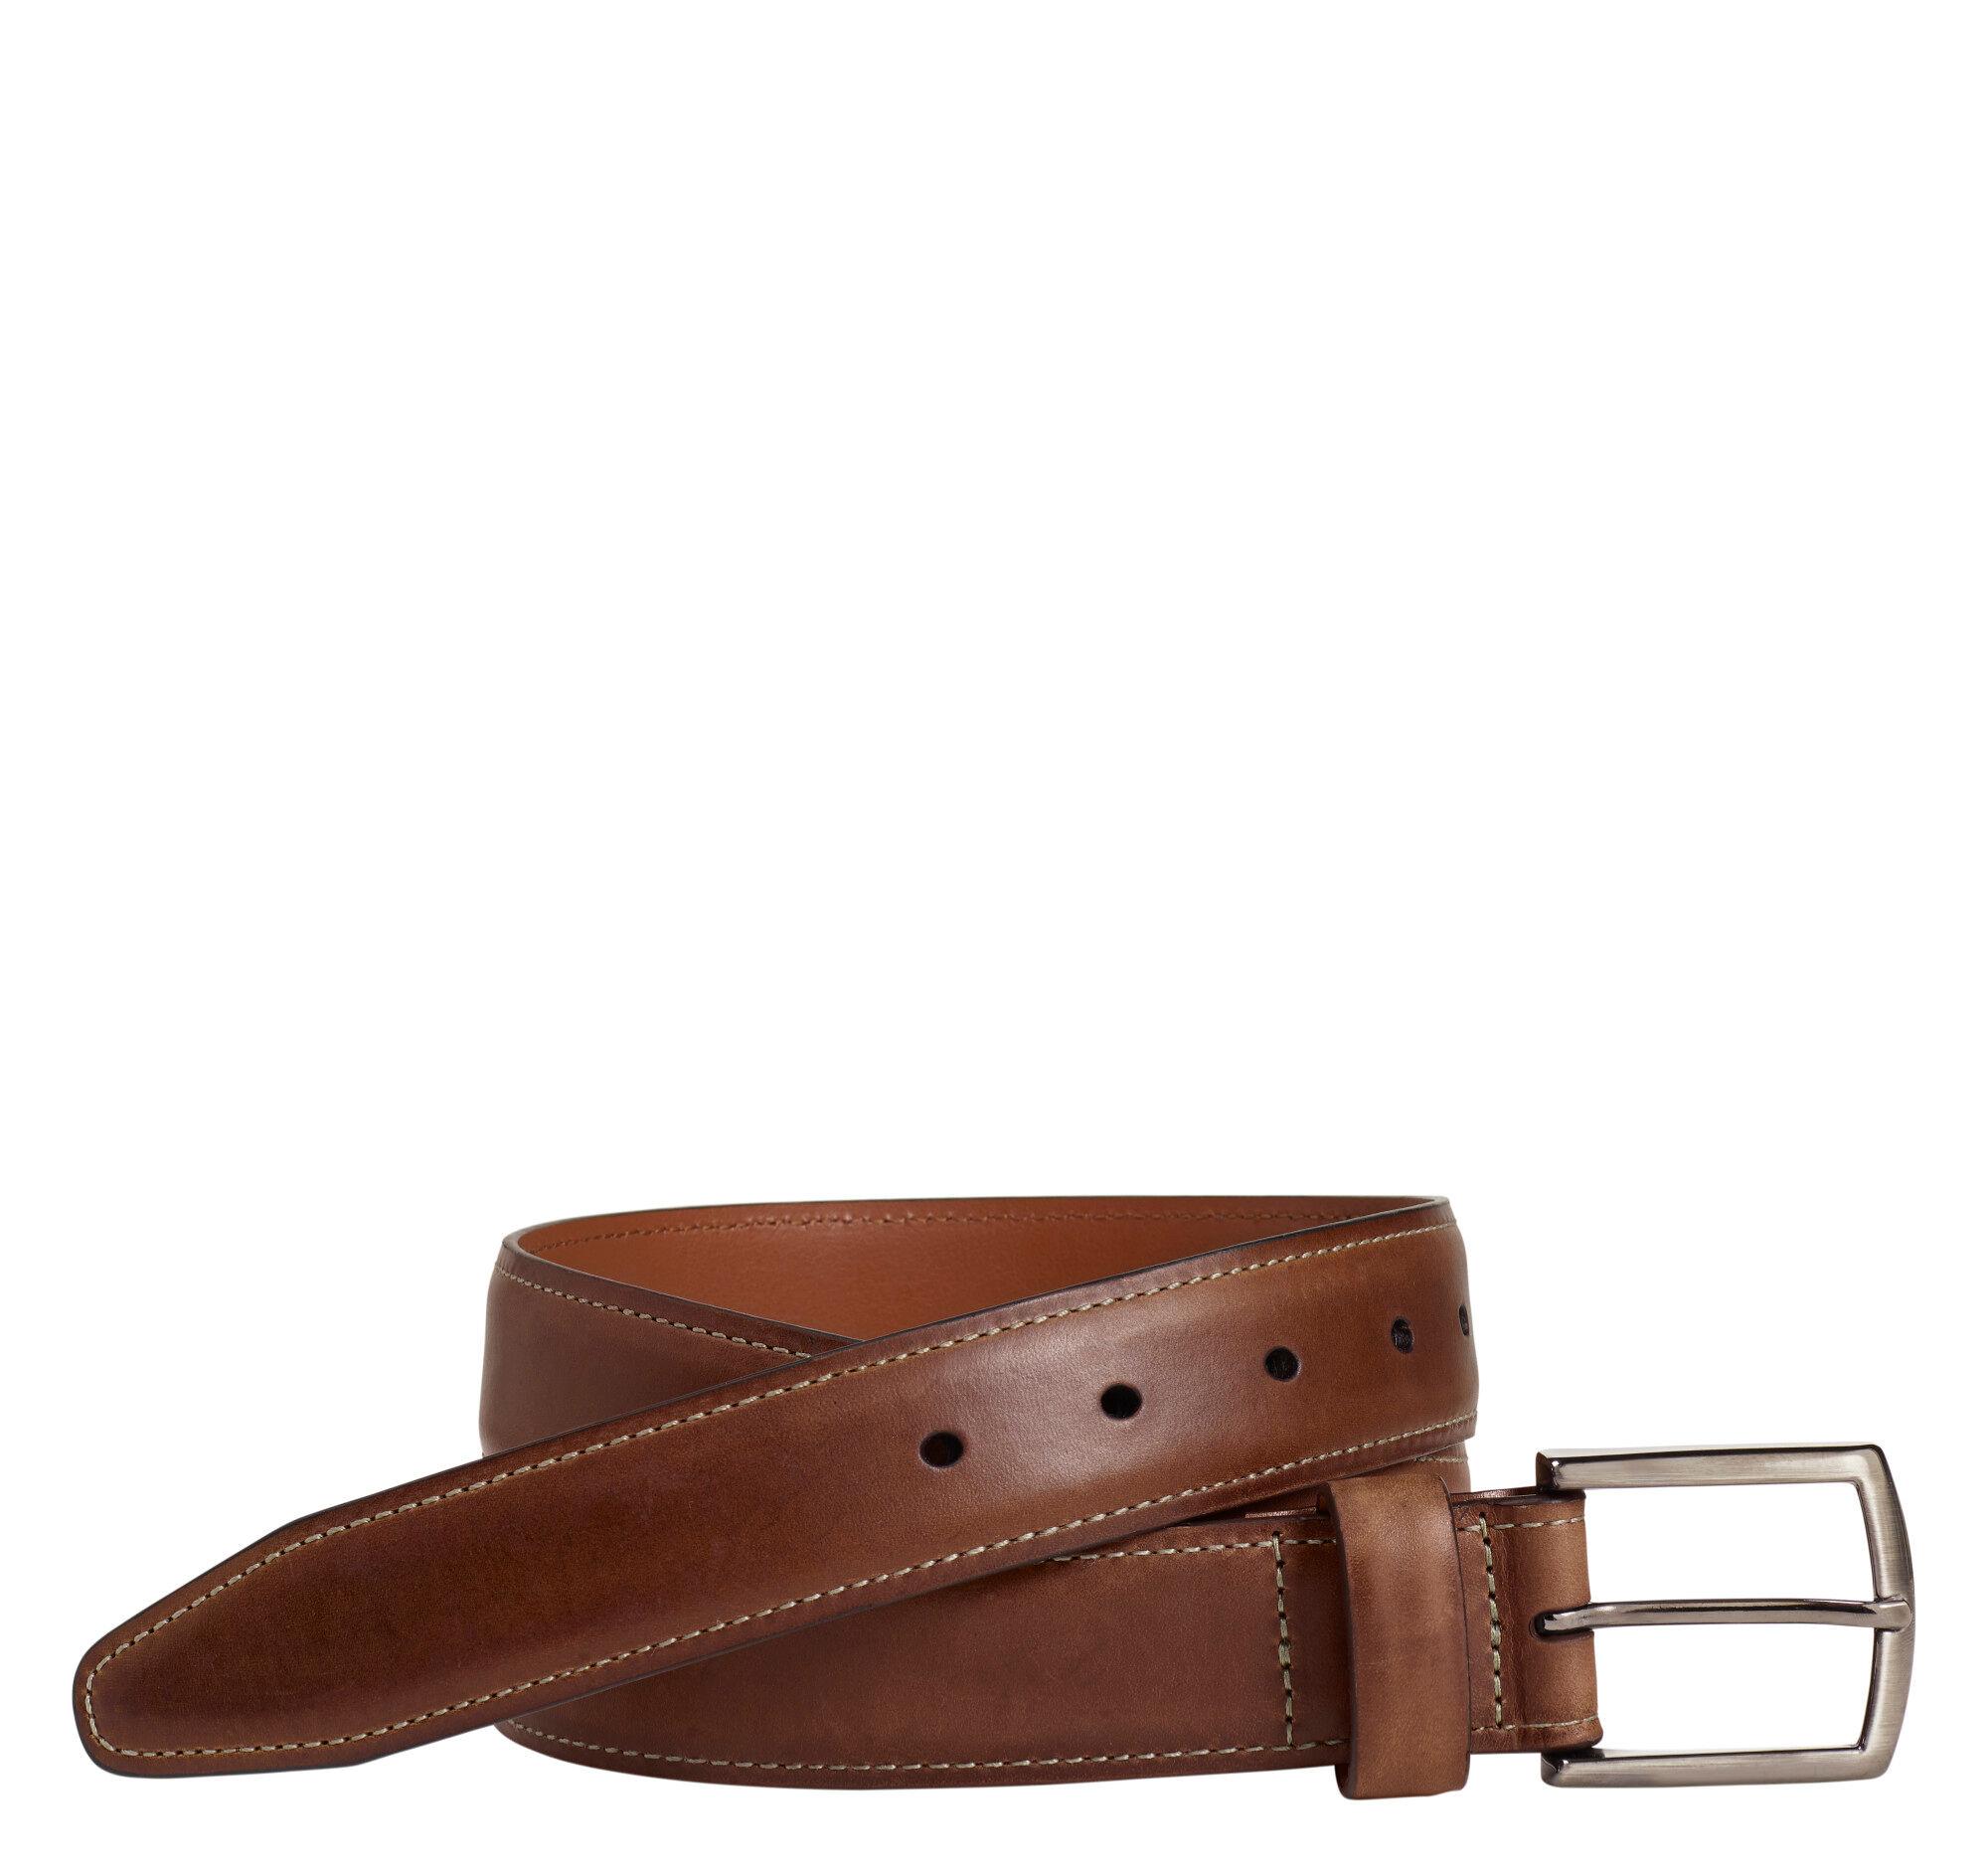 Johnston & Murphy Men's Oiled-Leather Belt - Brown - Size 42